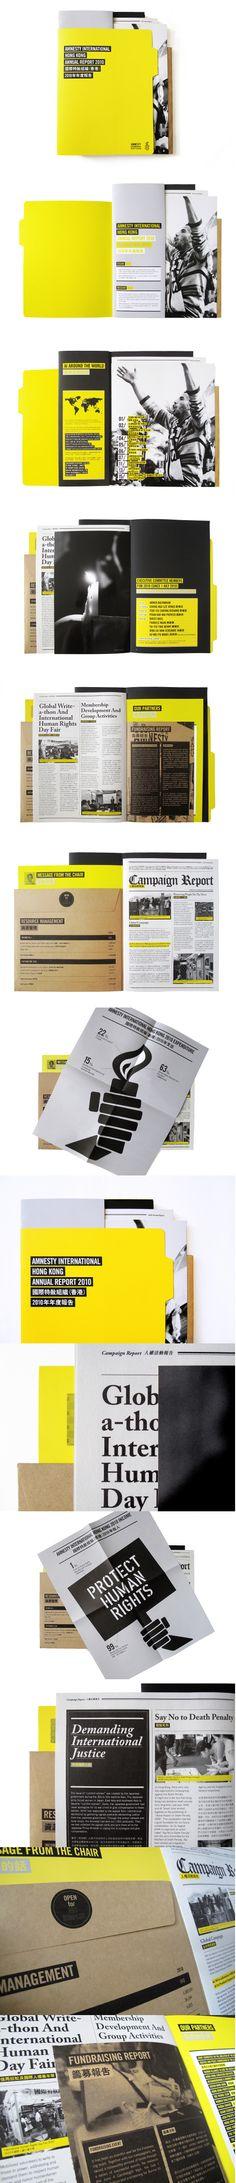 tgif   amnesty international hong kong 2010 annual report